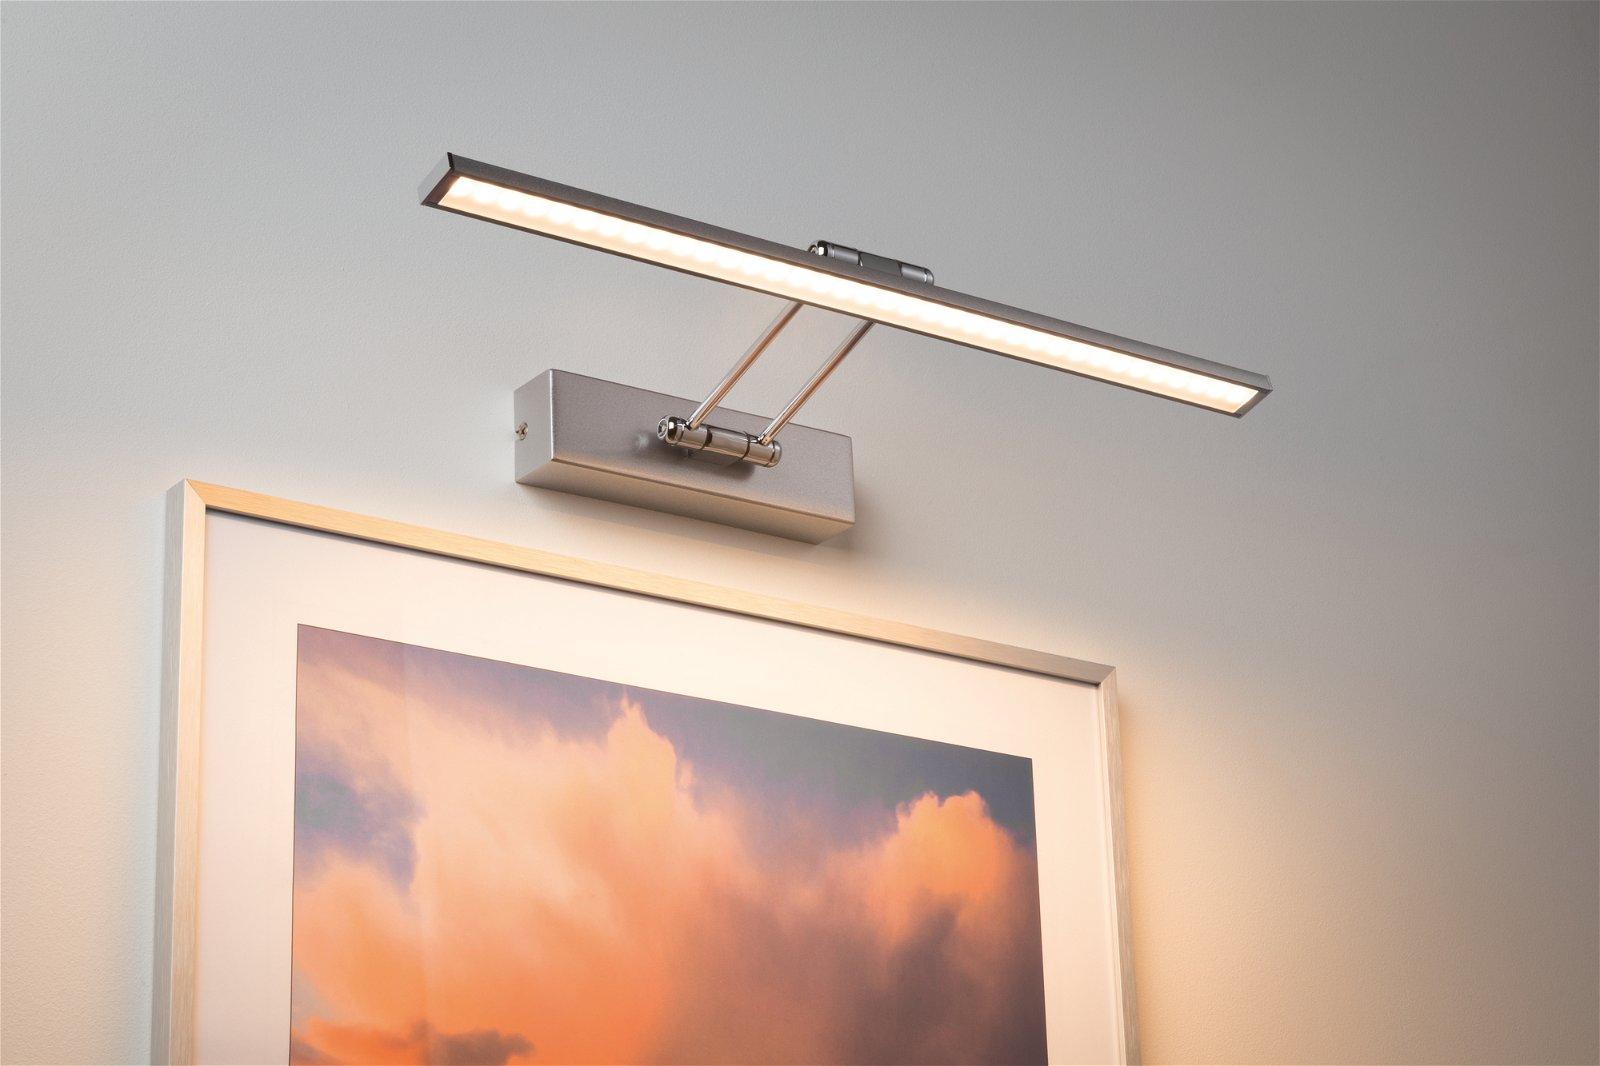 Galeria LED Picture luminaire Beam 2700K 850lm 230V 7W Brushed nickel/Chrome